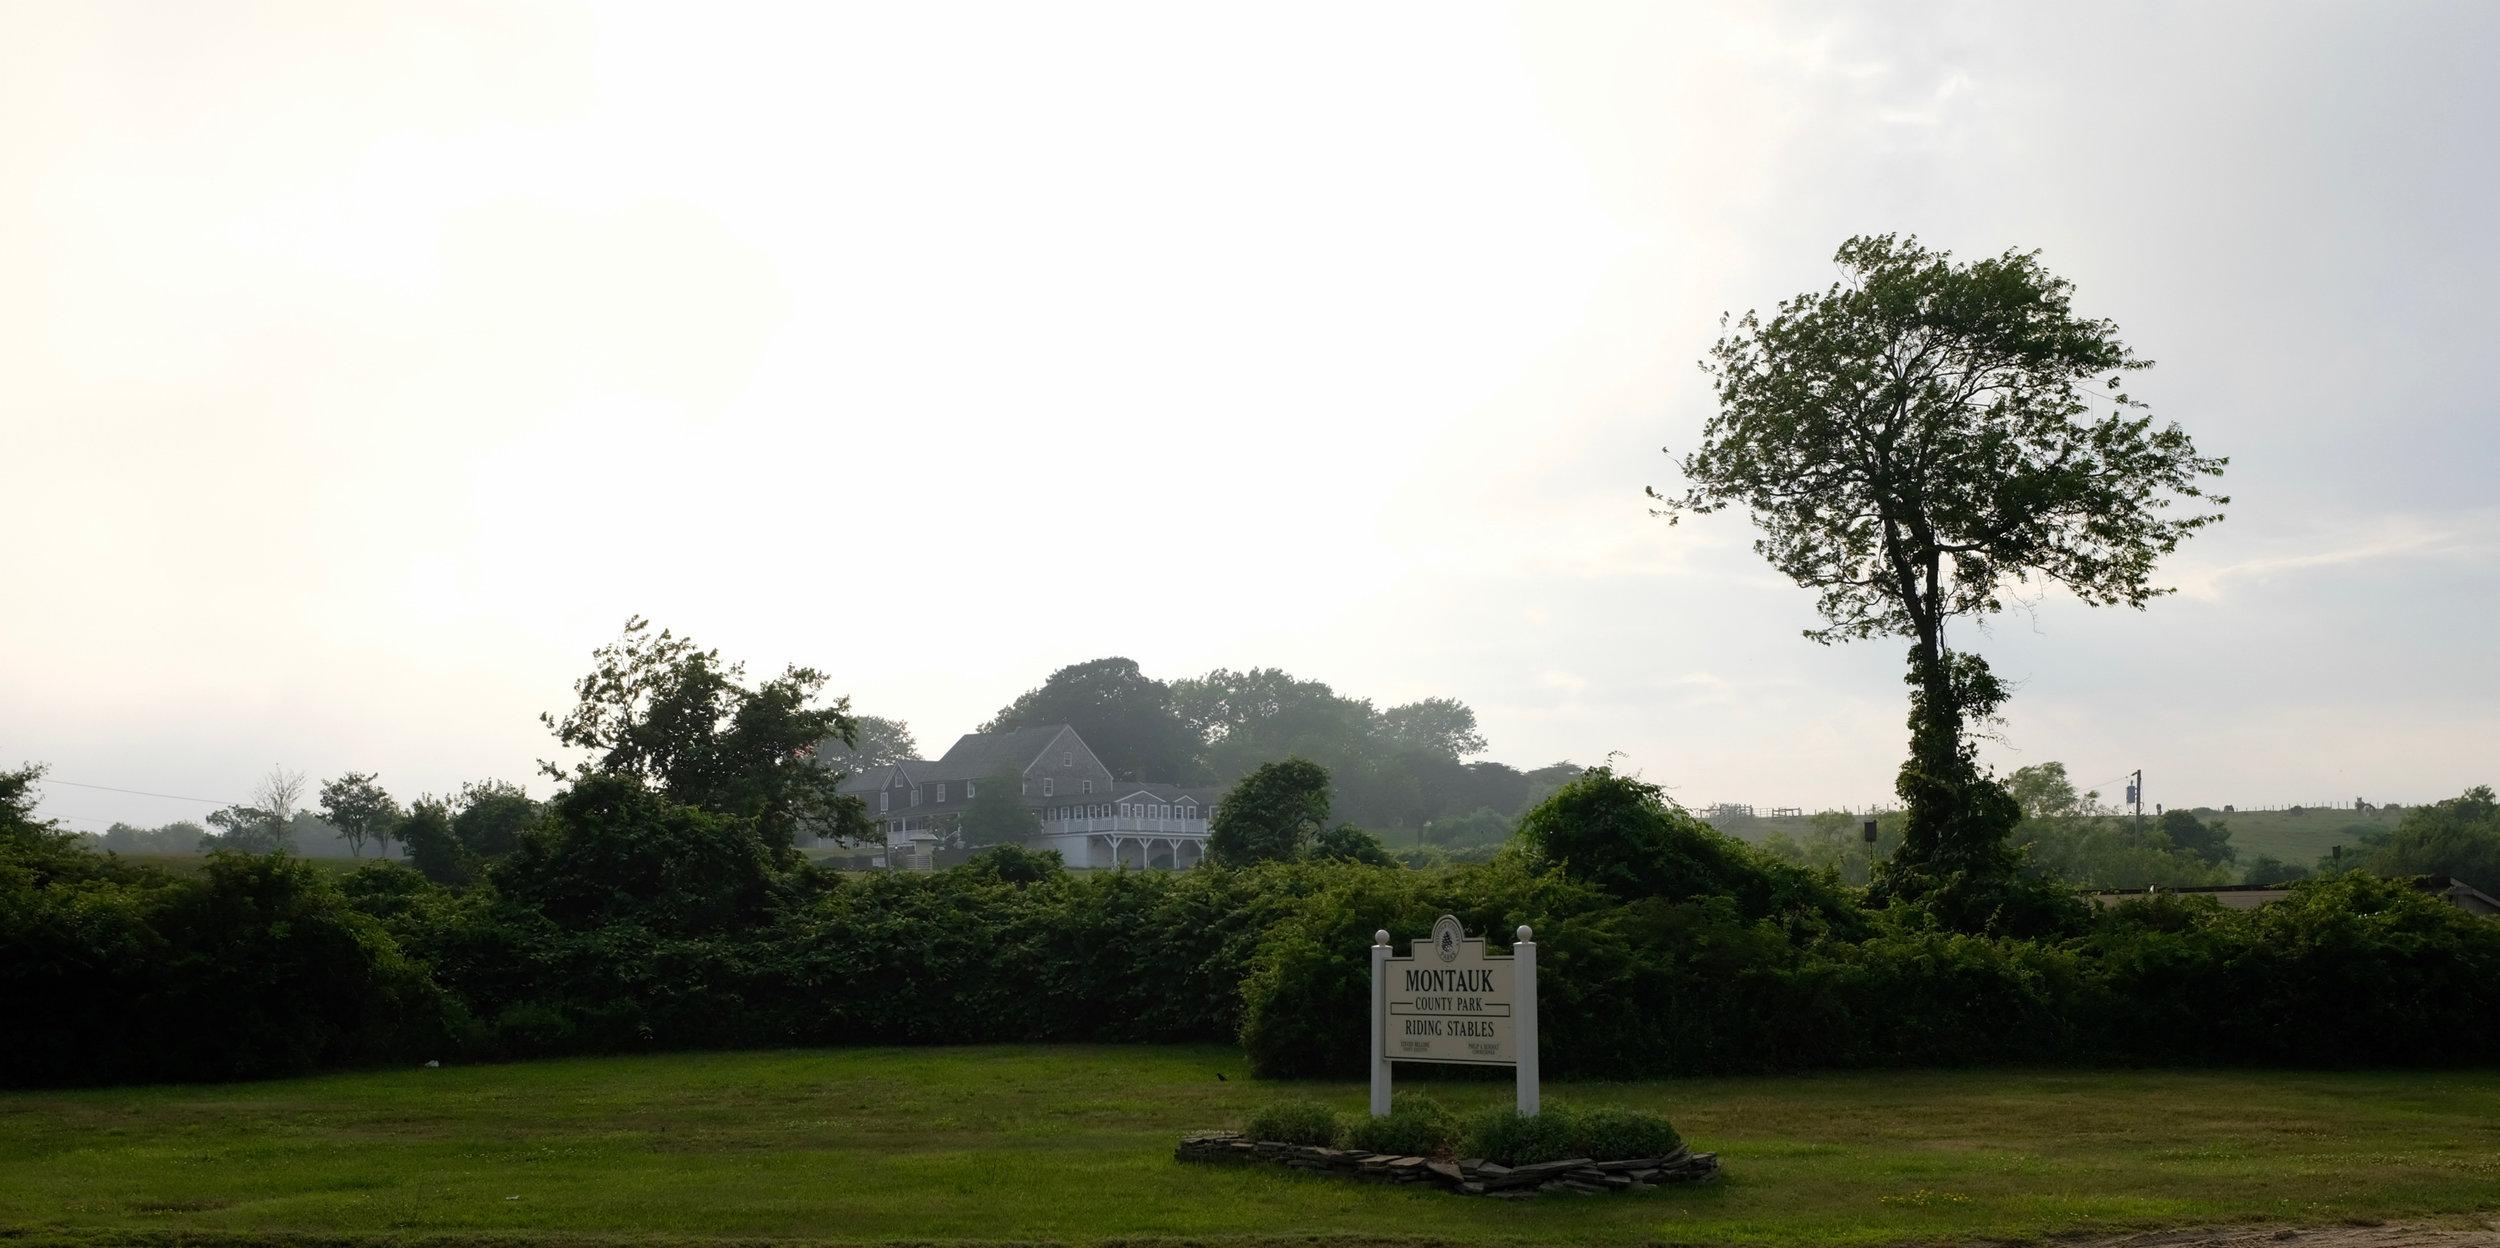 Montauk Long Island USABeFifty